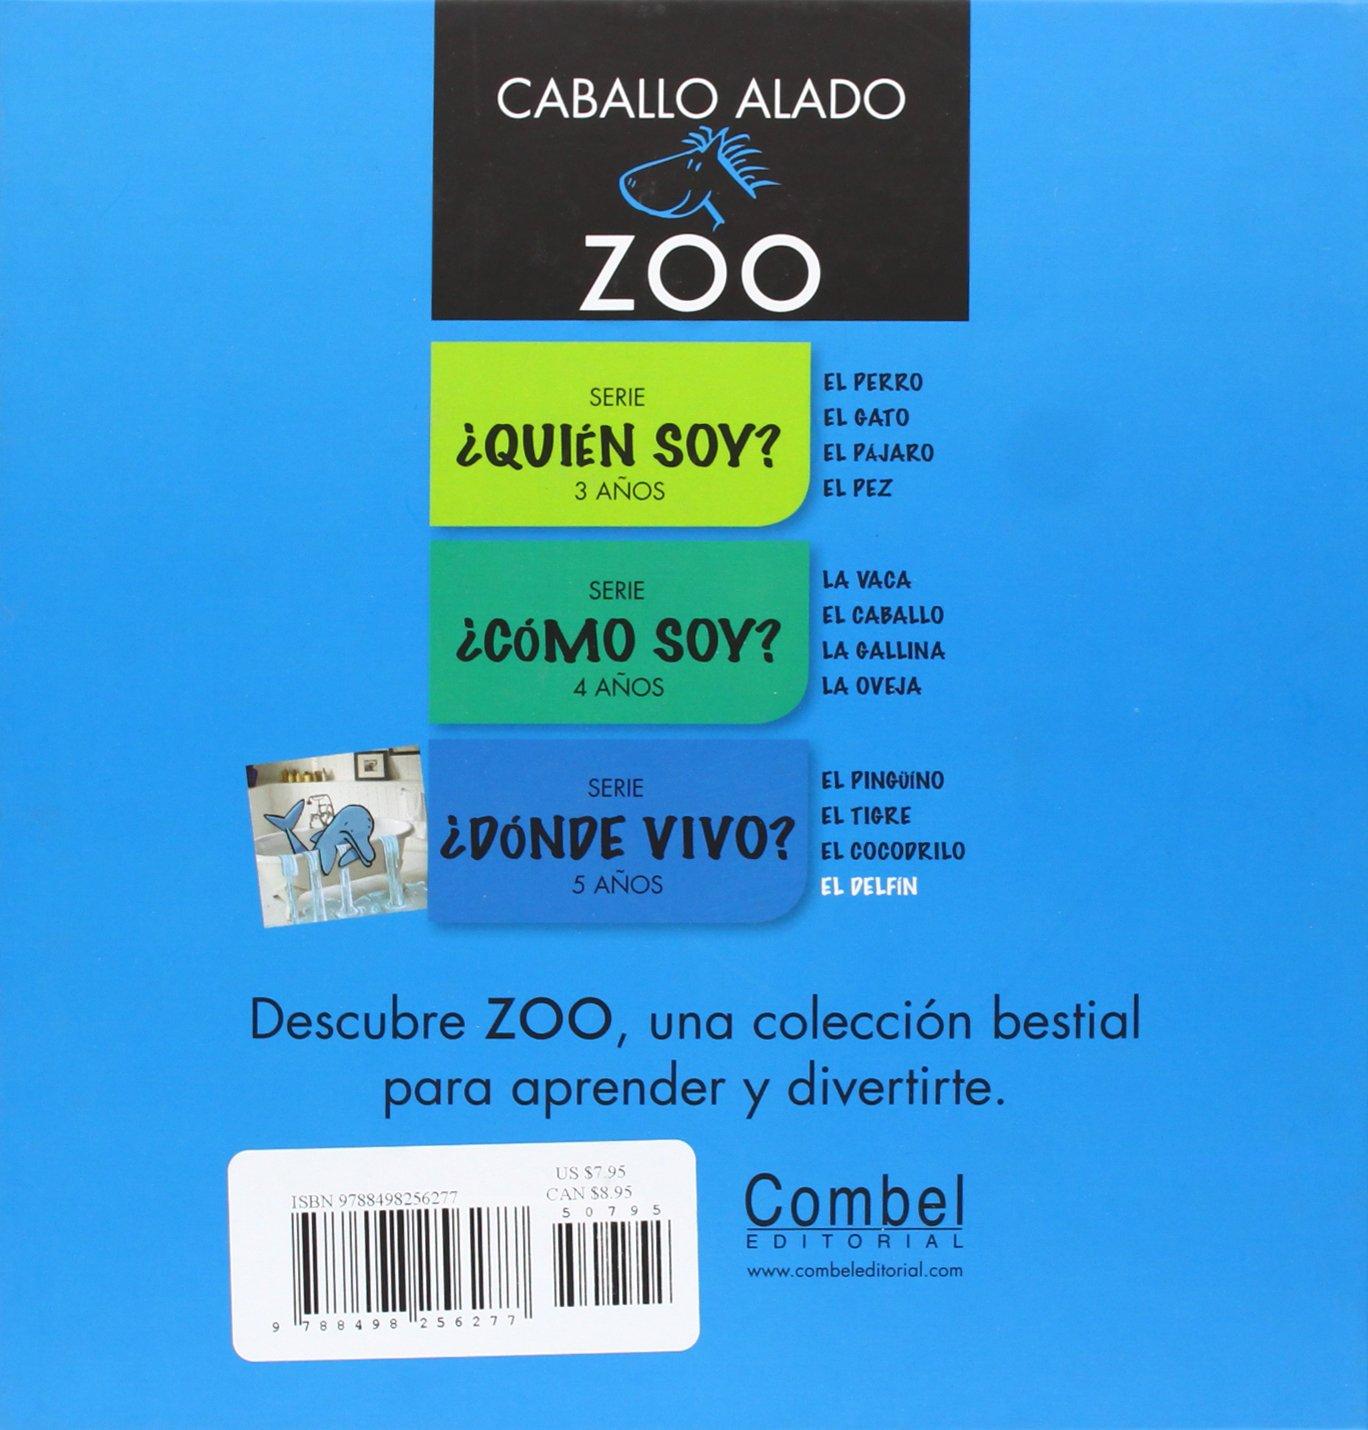 El delfín (Caballo alado ZOO) (Spanish Edition): Montse Ganges, Jordi Sales: 9788498256277: Amazon.com: Books